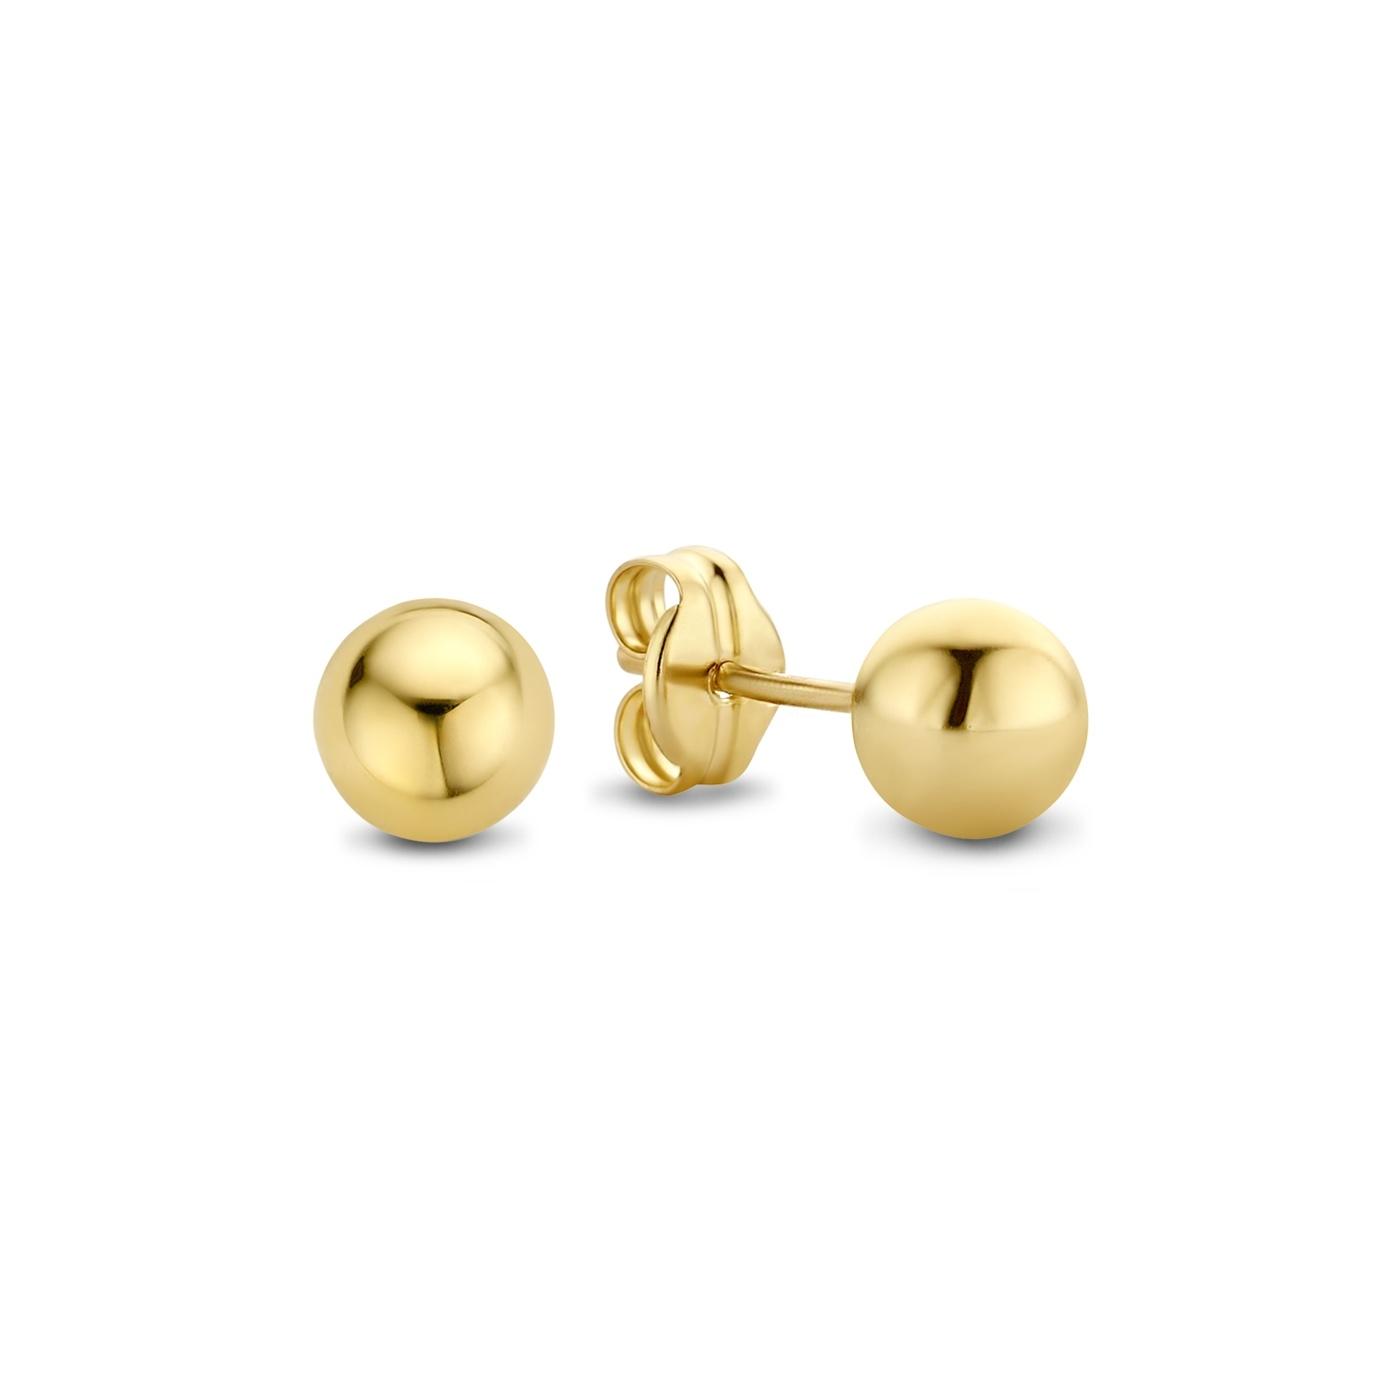 Isabel Bernard Rivoli Coco 14 karaat gouden oorknoppen met bolletje